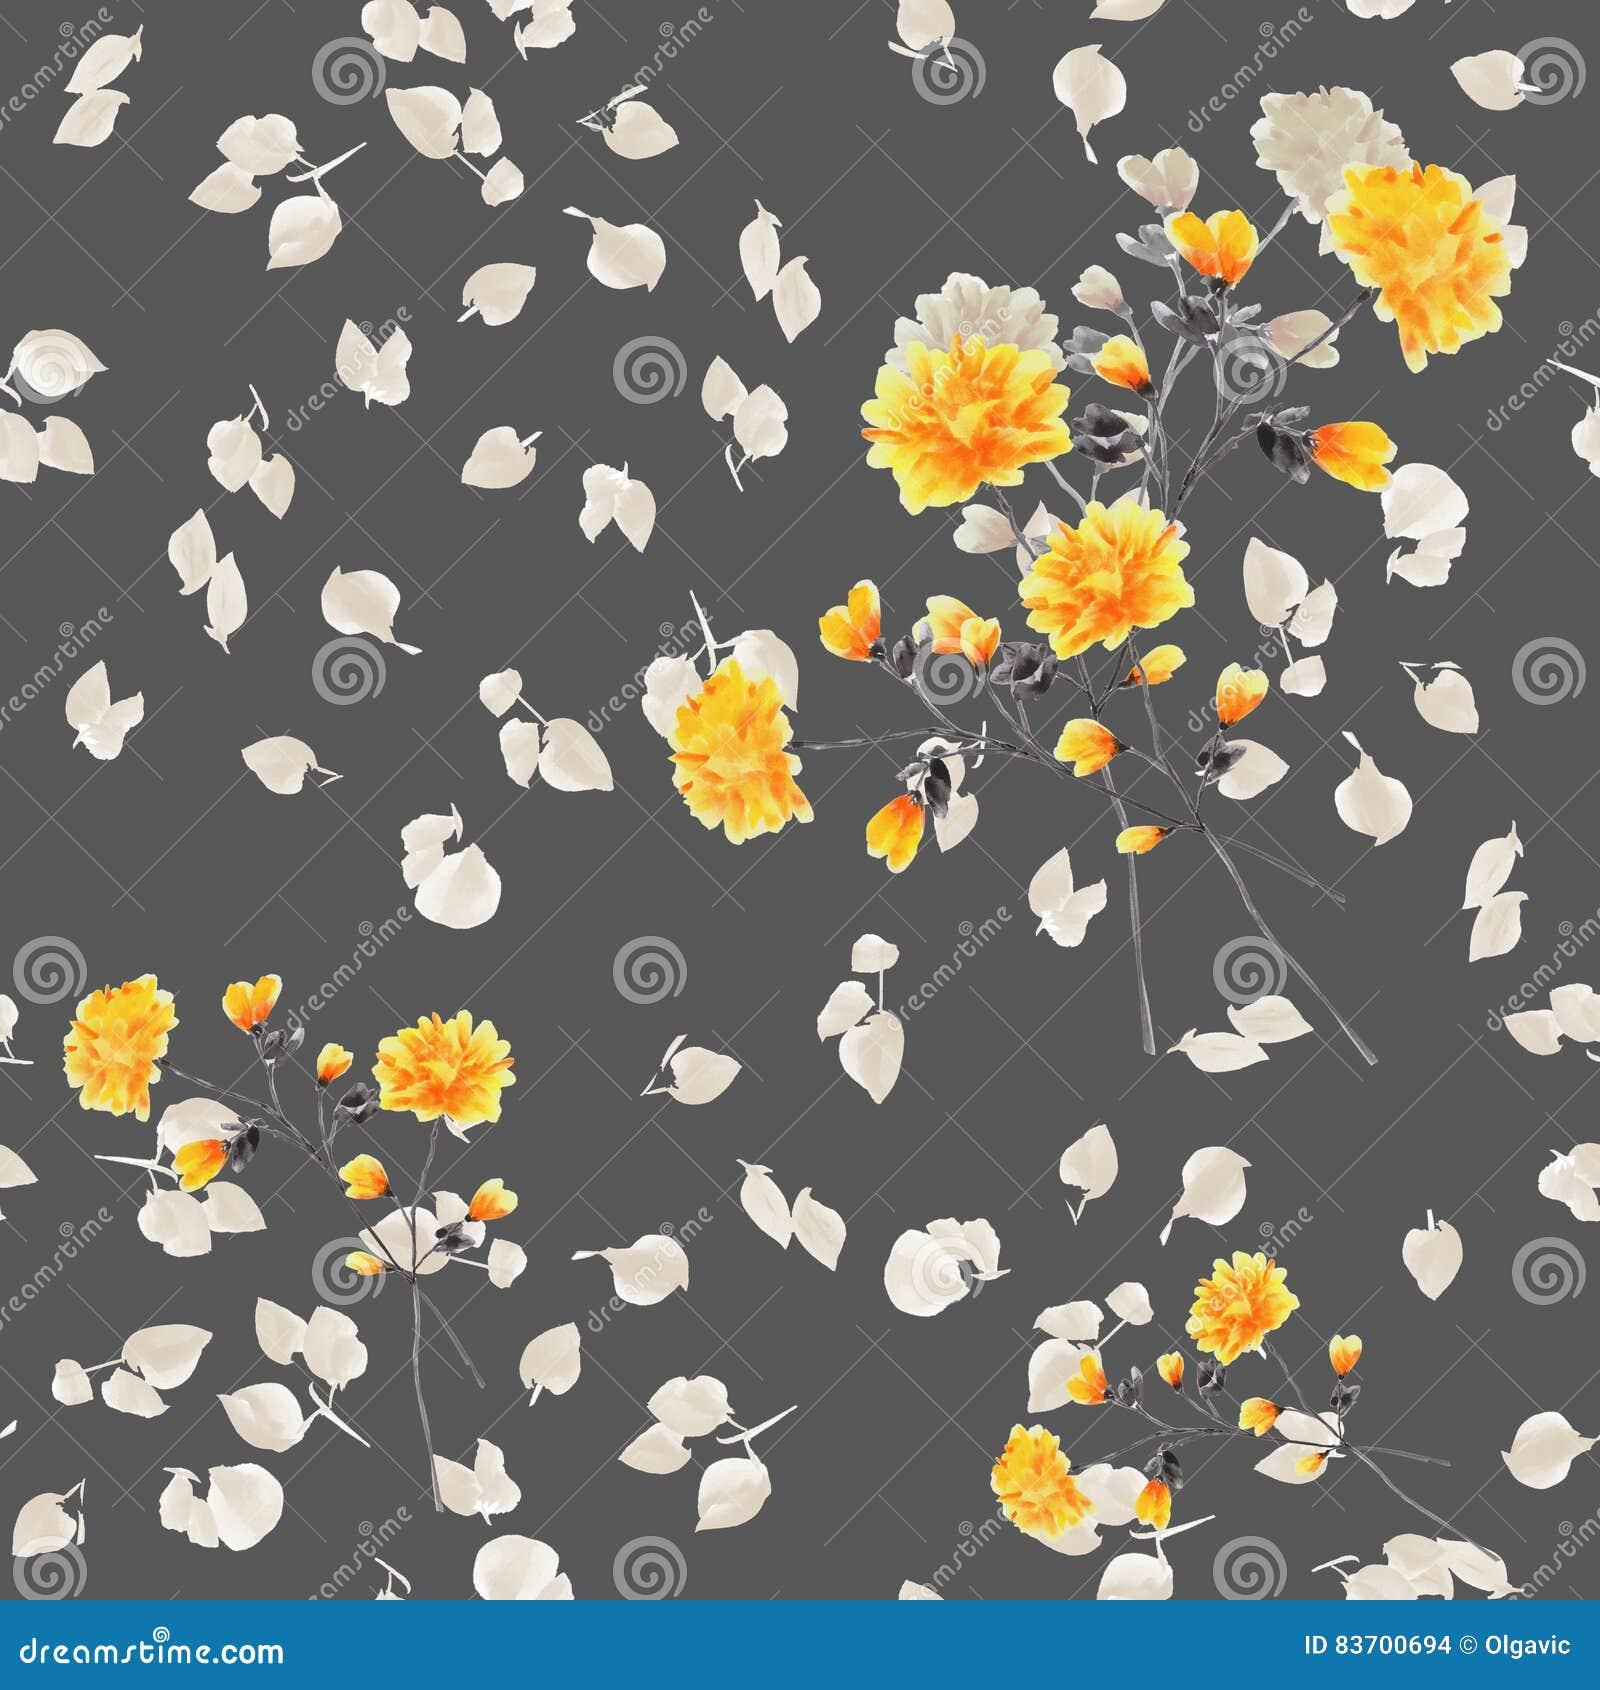 Seamless pattern of yellow flowers and branches on a deep gray seamless pattern of yellow flowers and branches on a deep gray background watercolor mightylinksfo